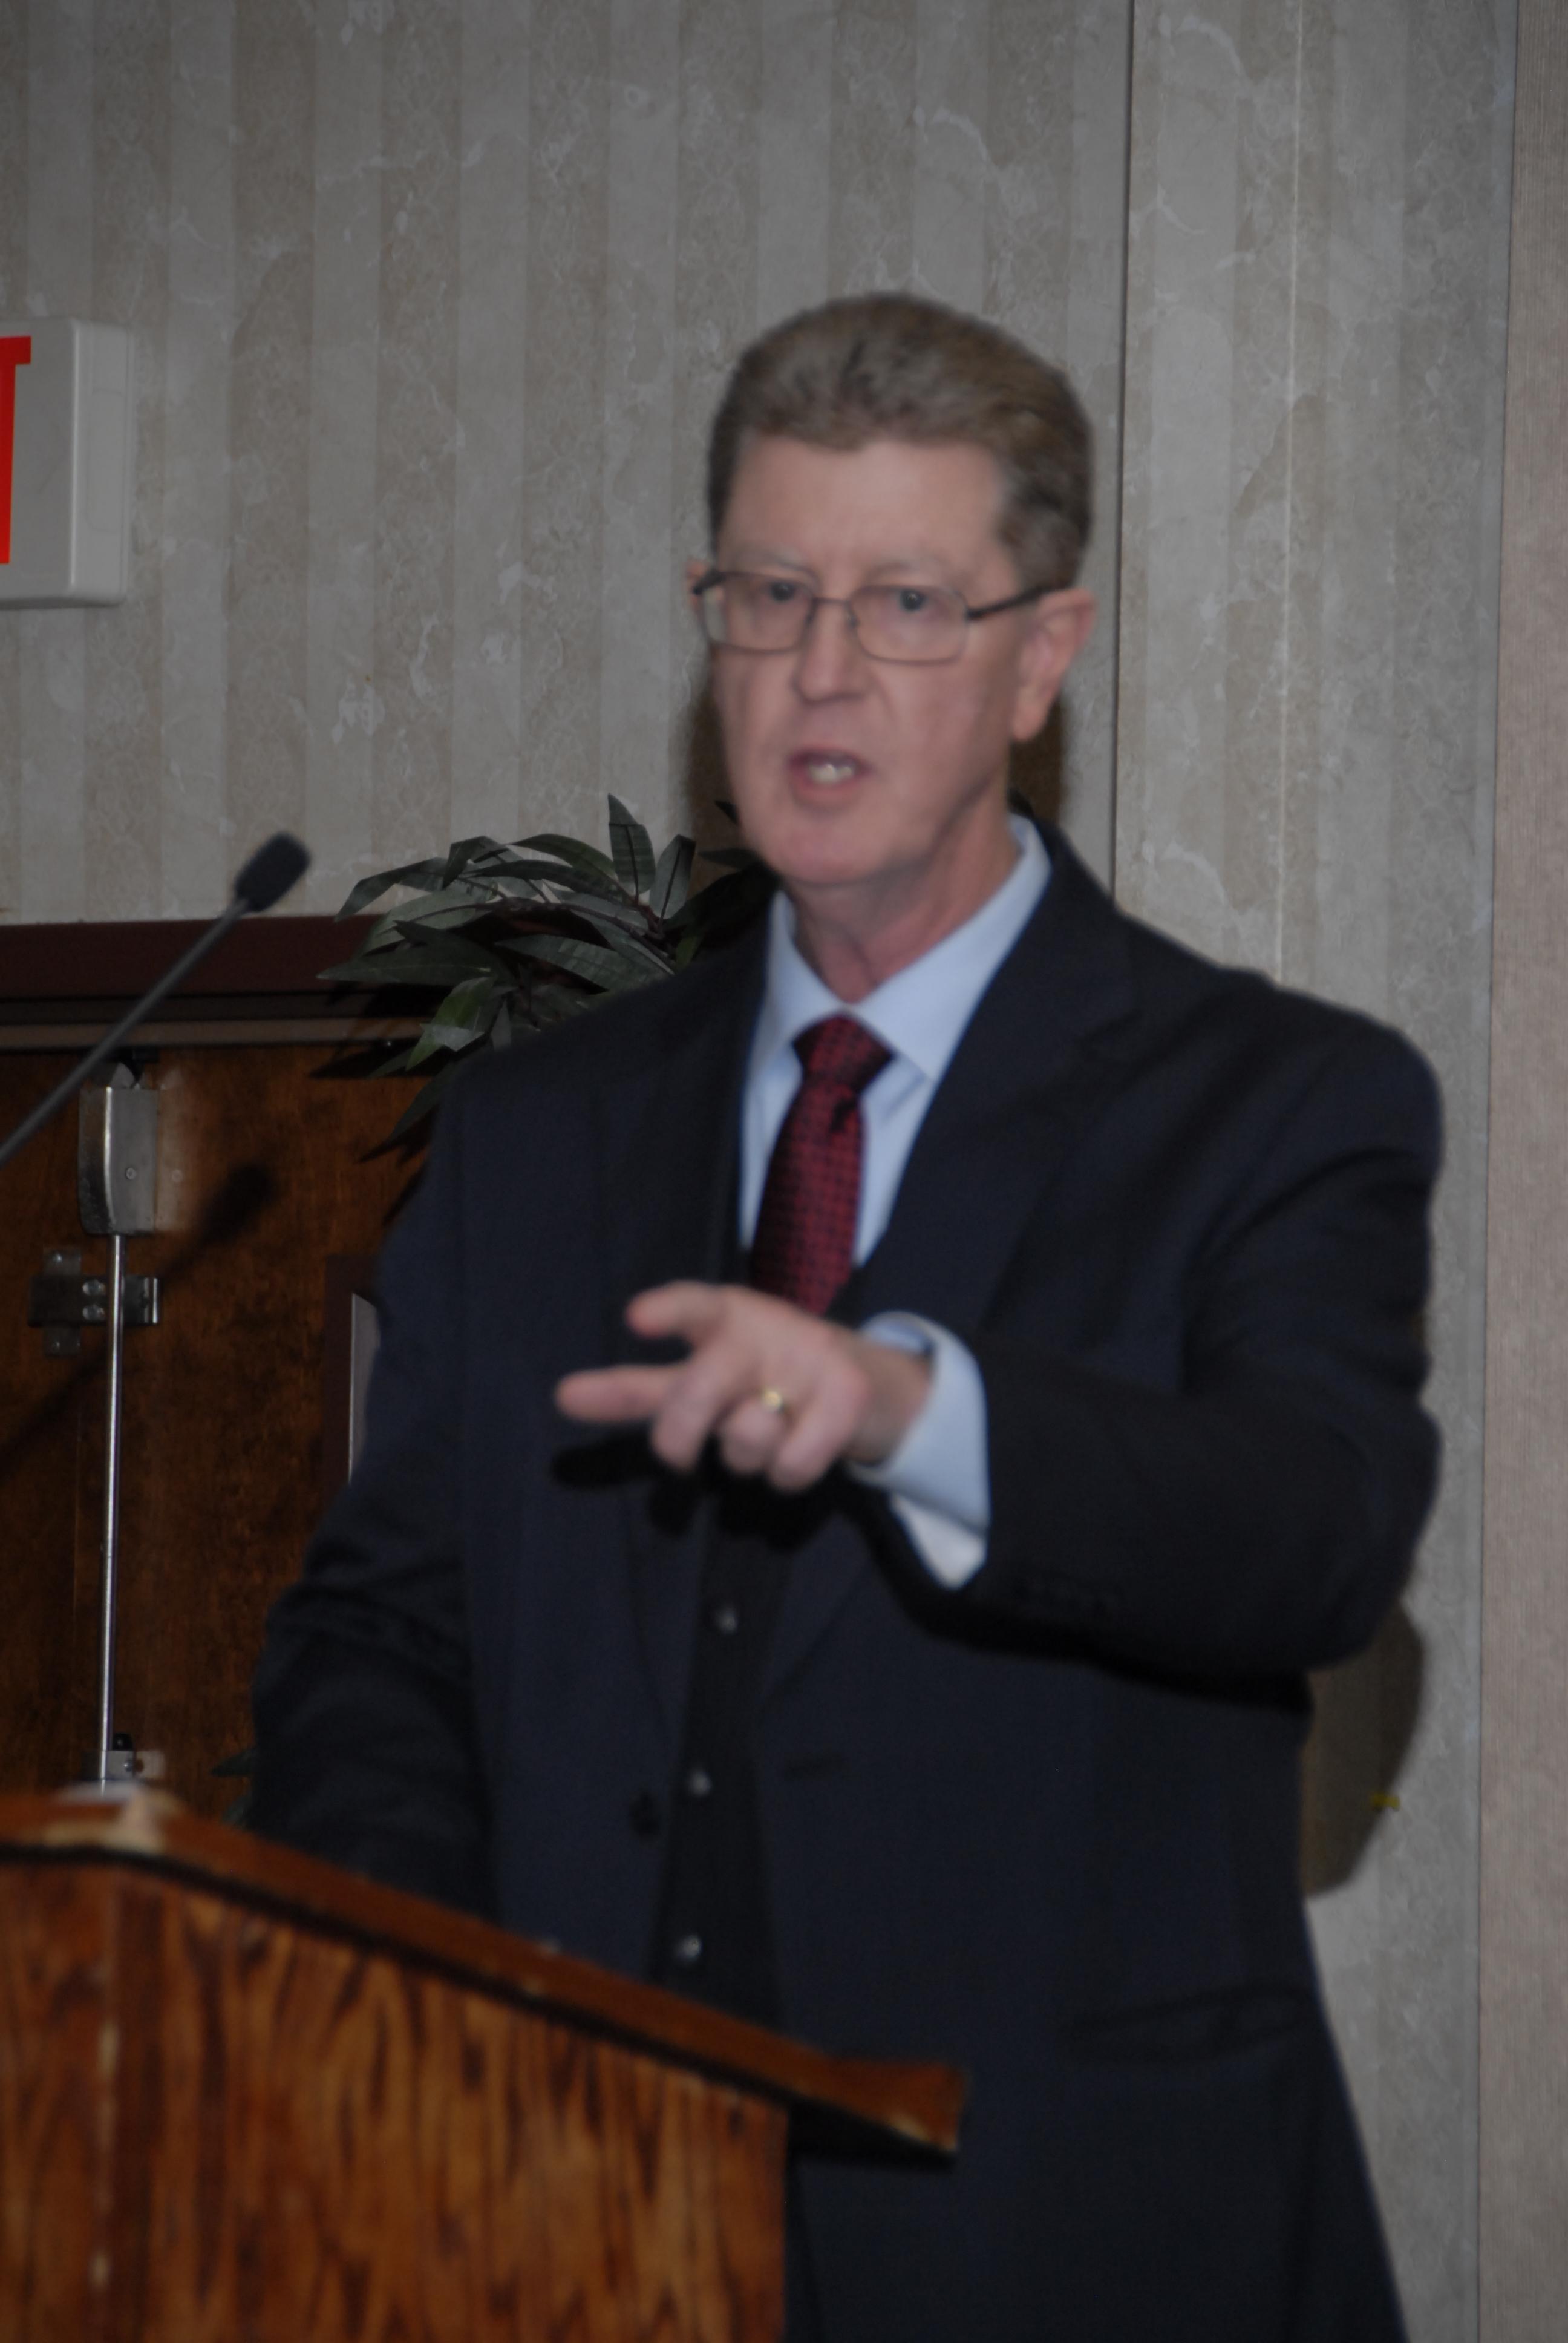 Dr. Robert Jackson